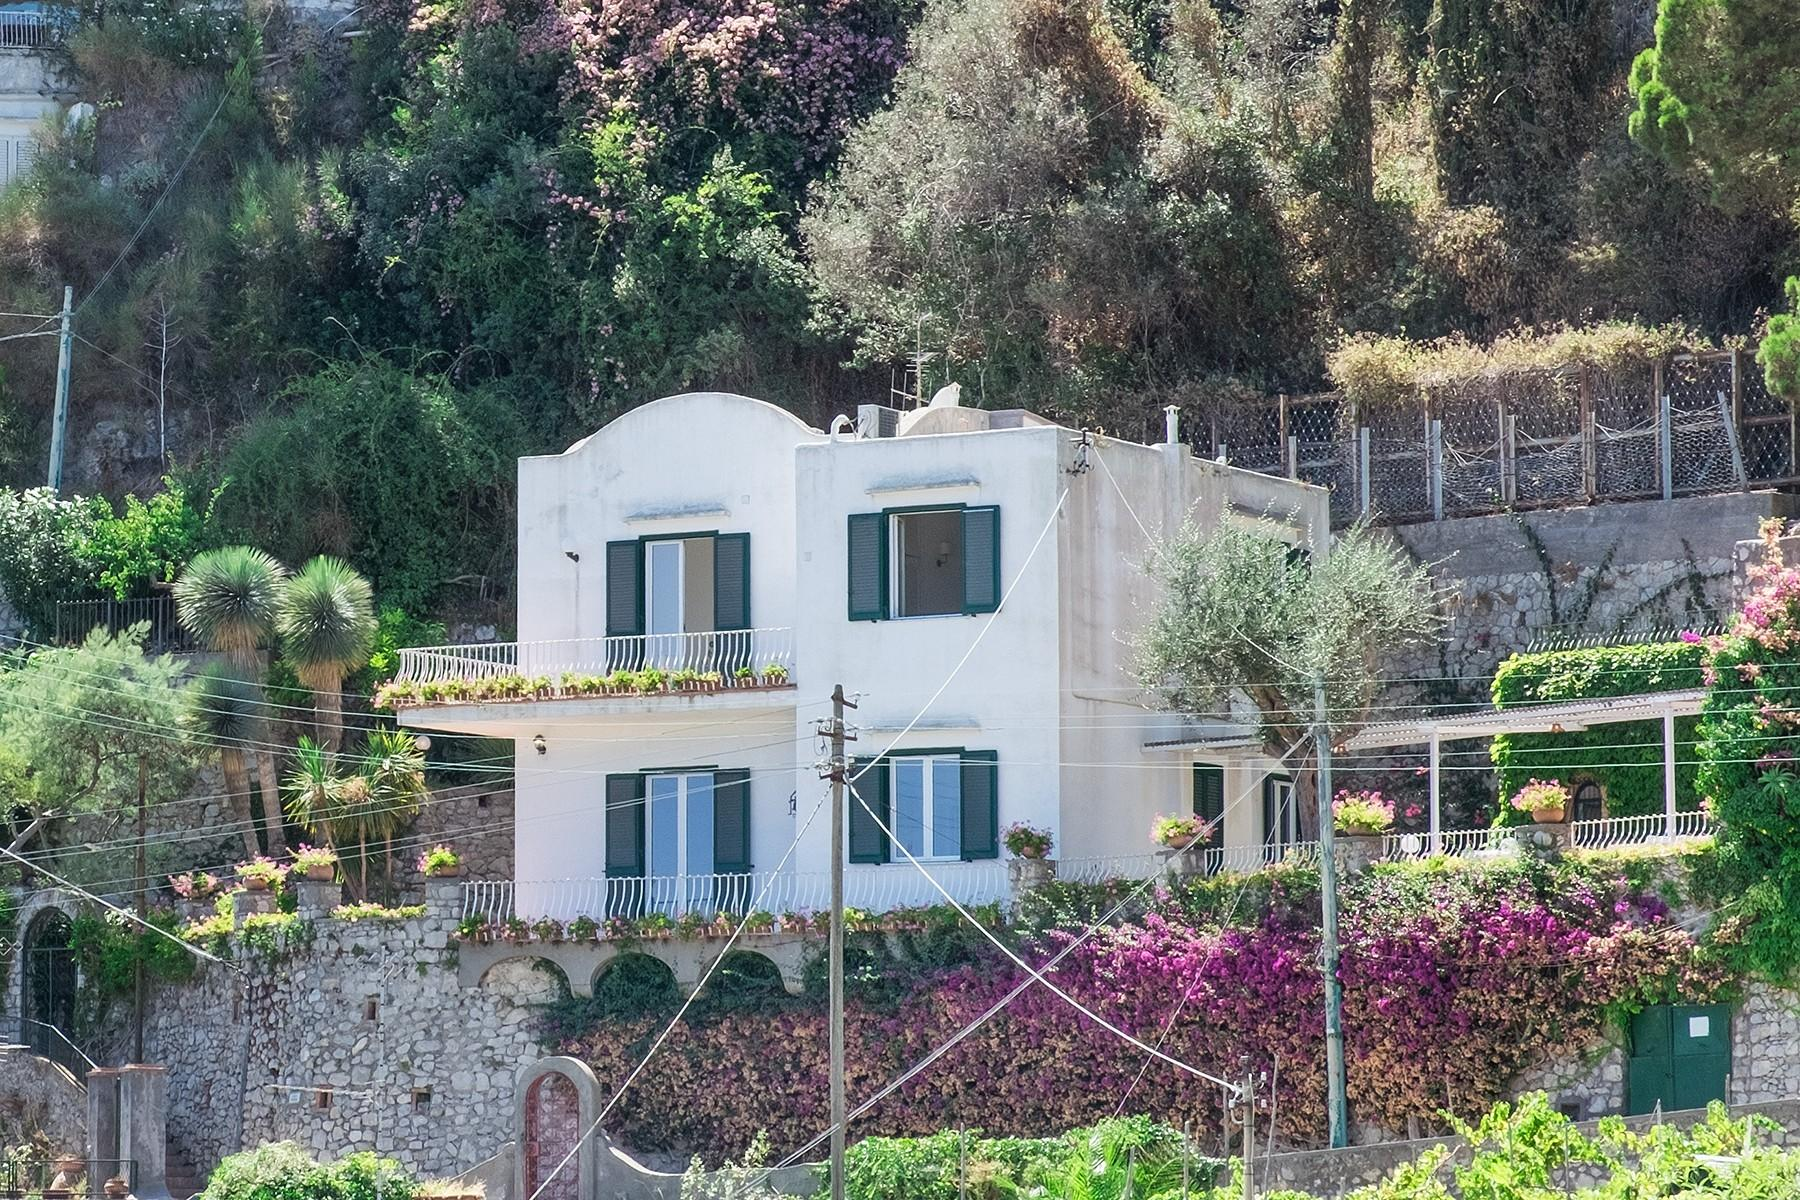 Прекрасная вилла с панорамным видом на море в центре легендарного острова Капри, Италия - 20